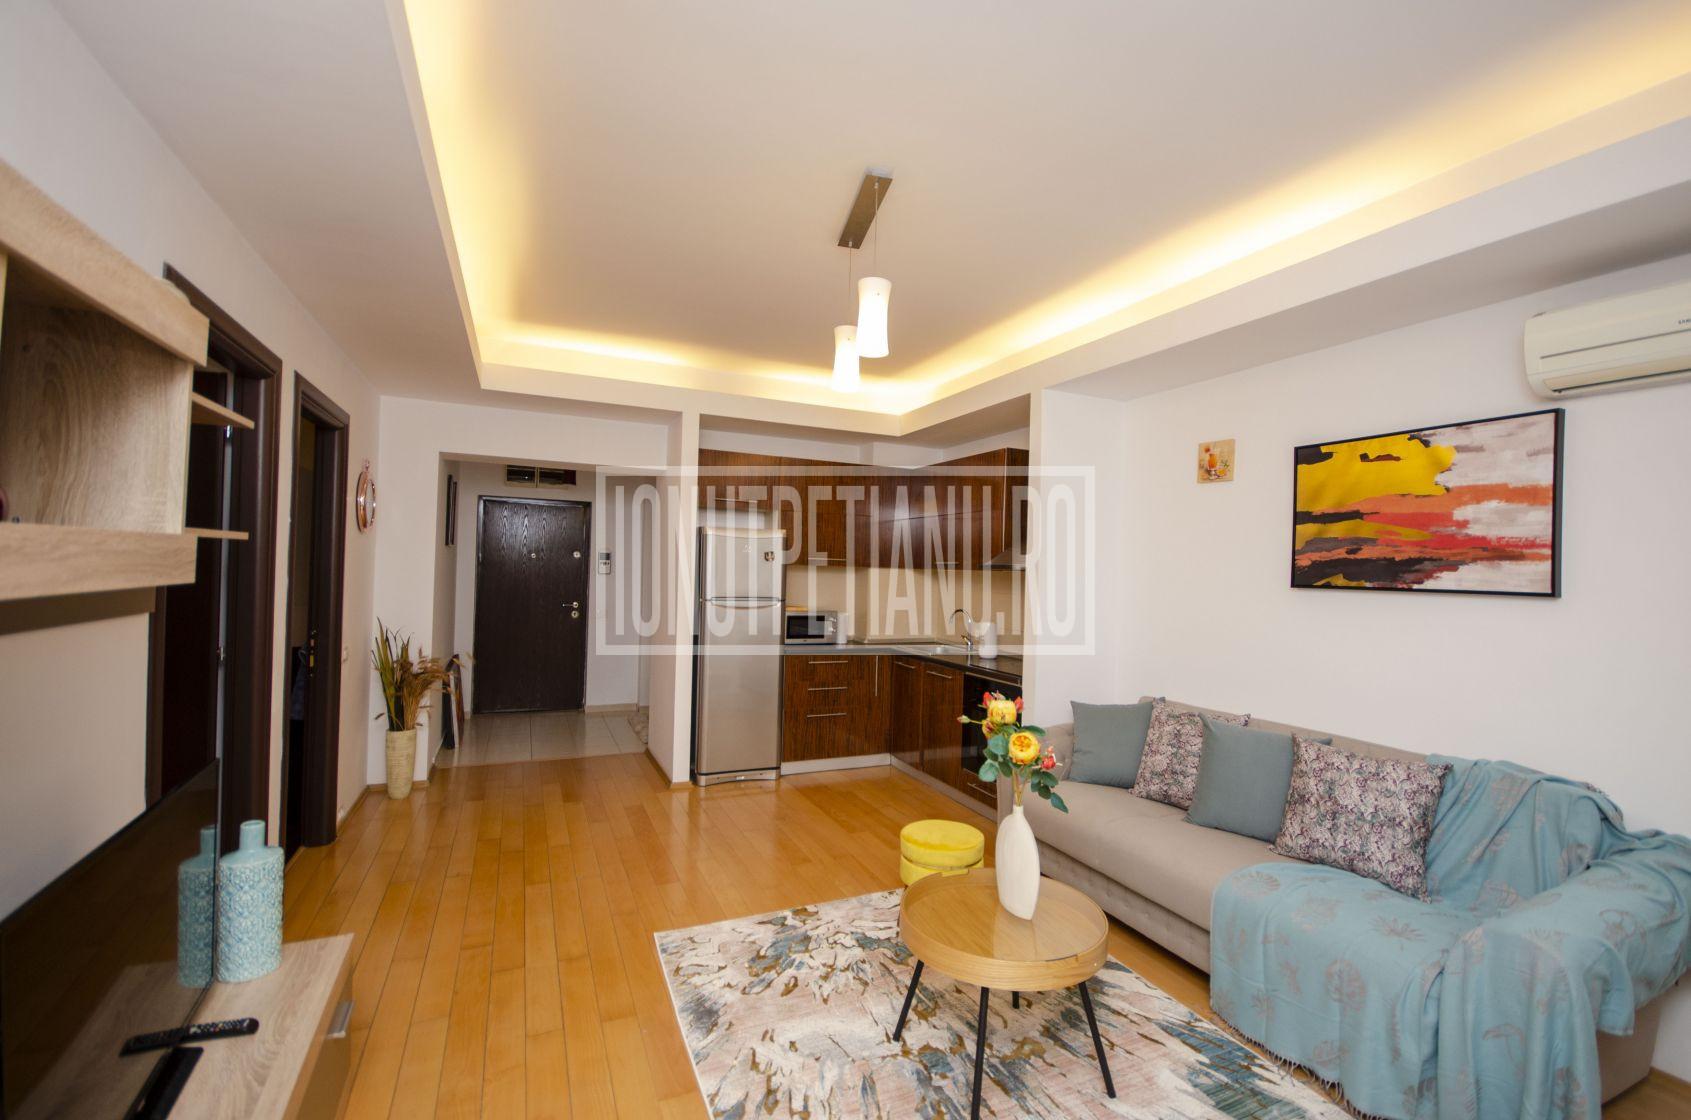 Aviatiei apartament cu 2 camere langa Parcul Herastrau